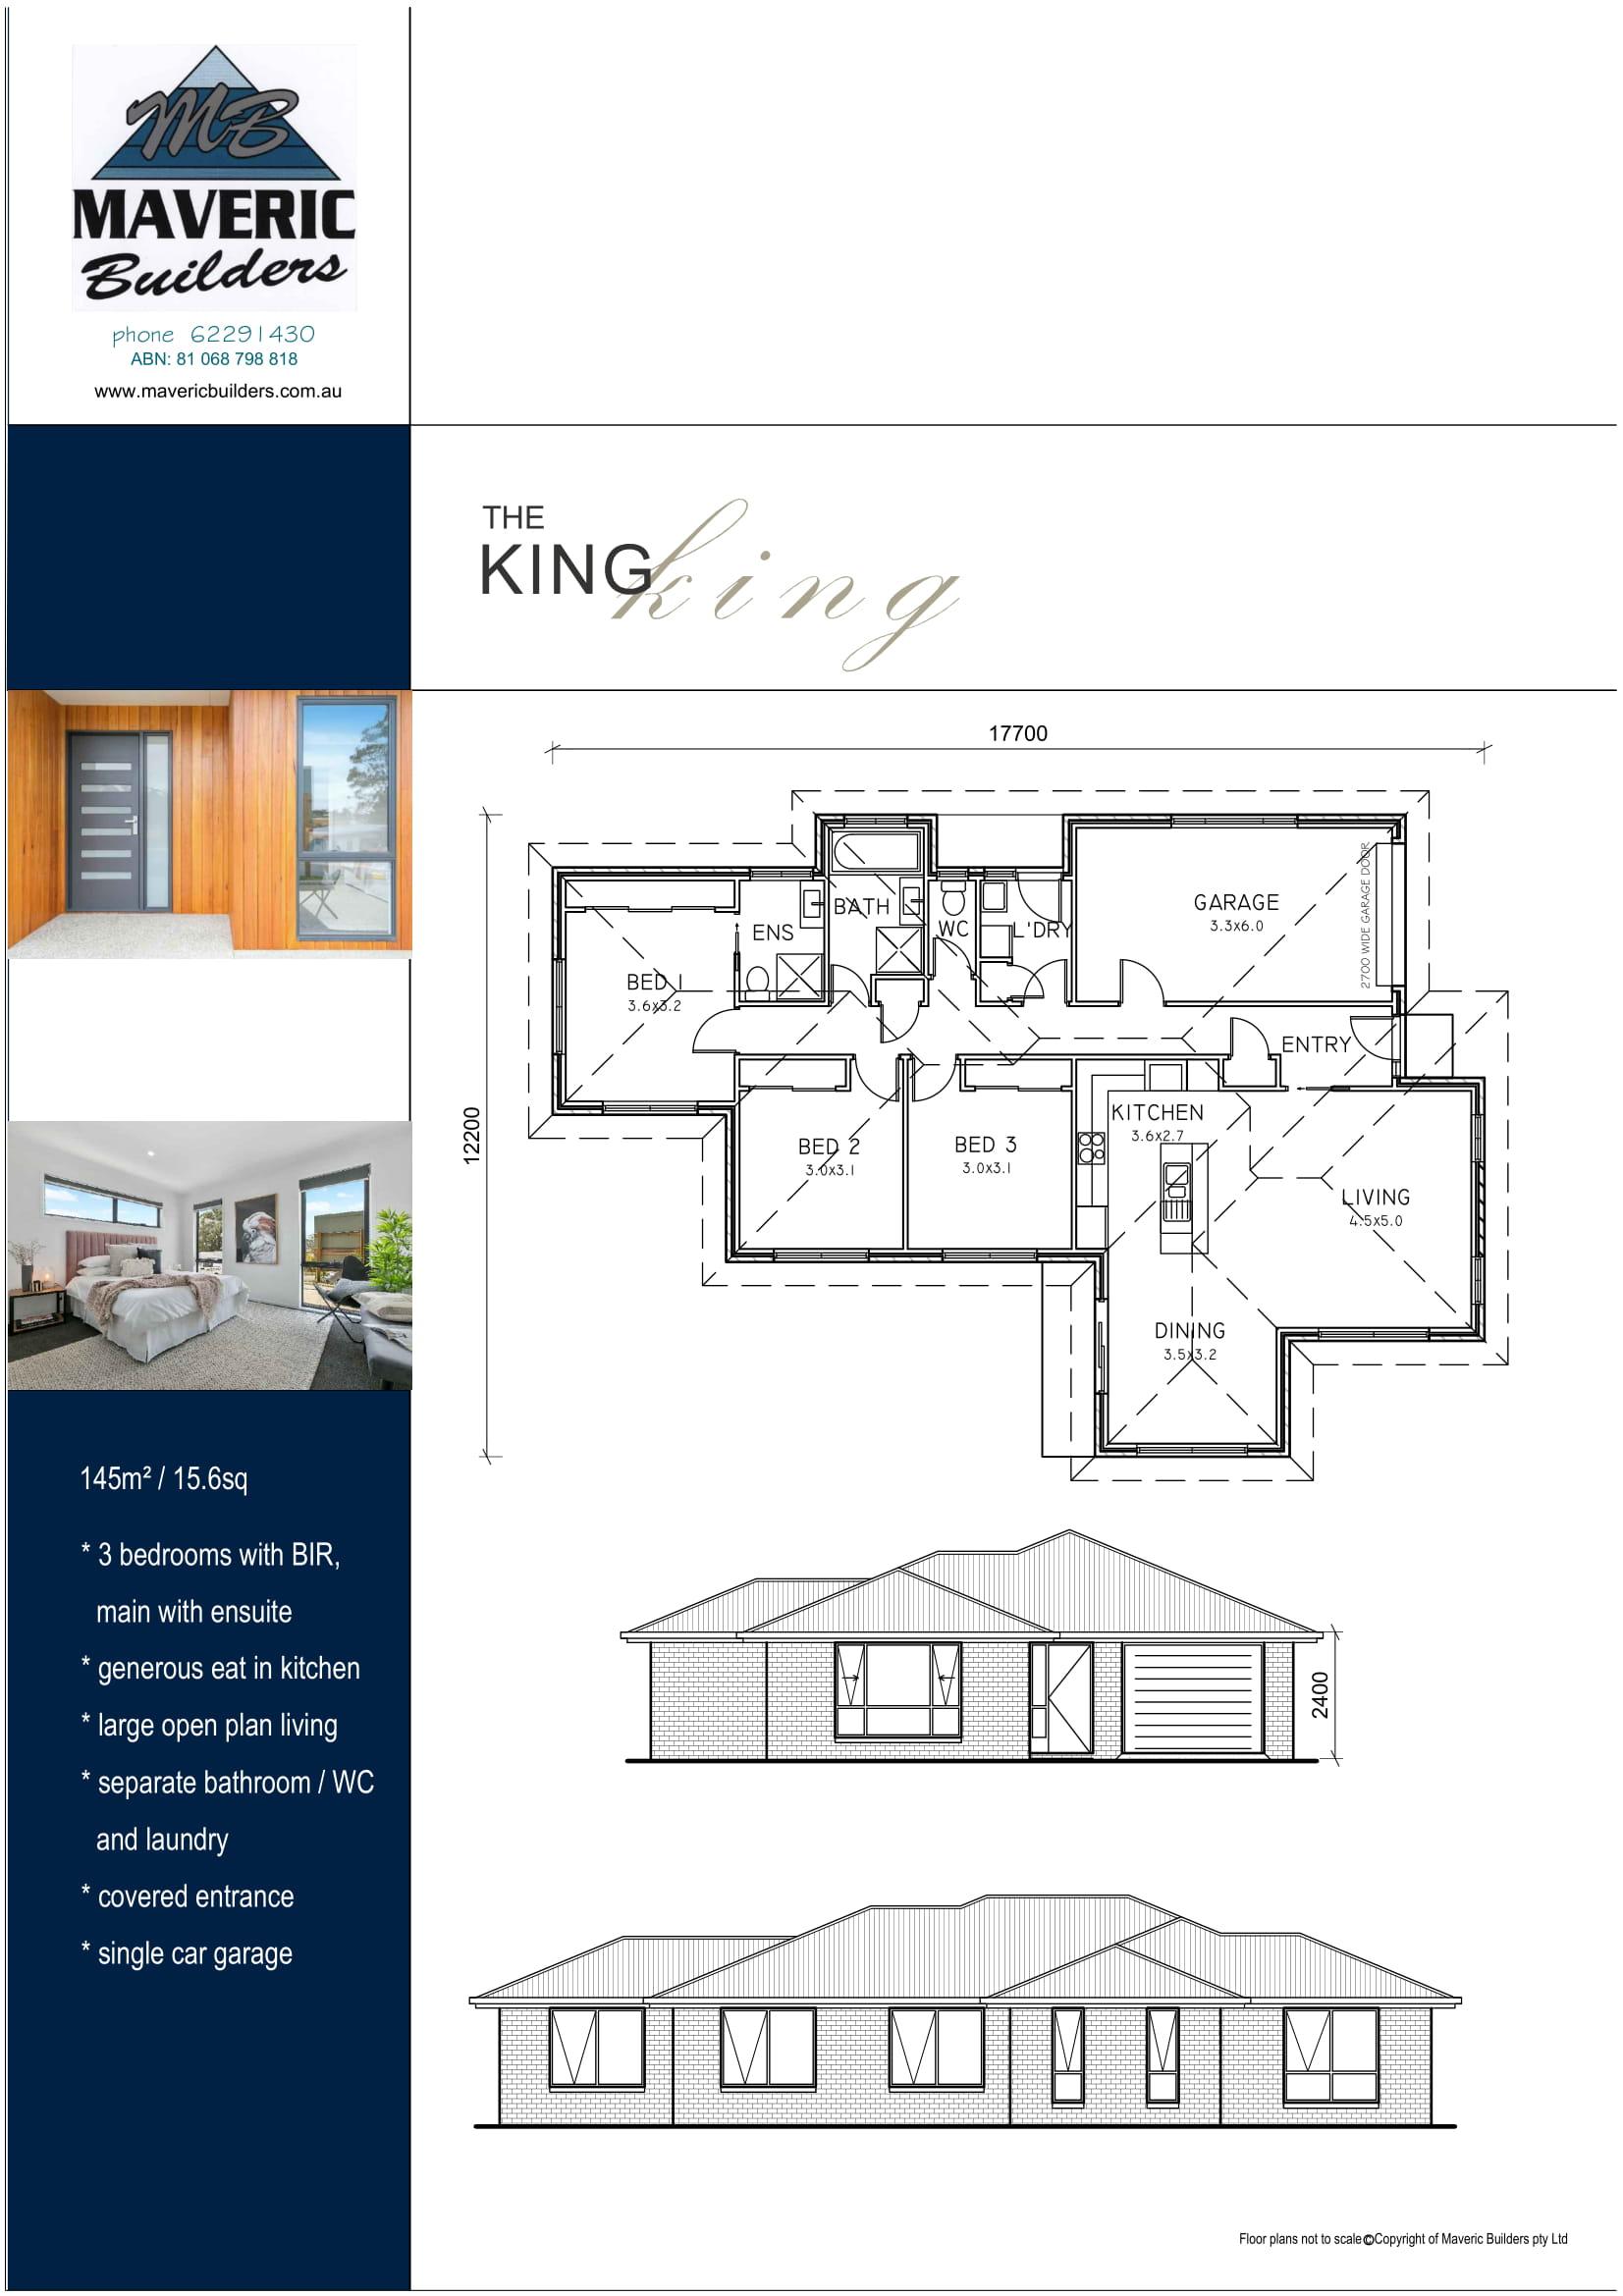 A4 Brochures 2019 01 - 24-12.jpg